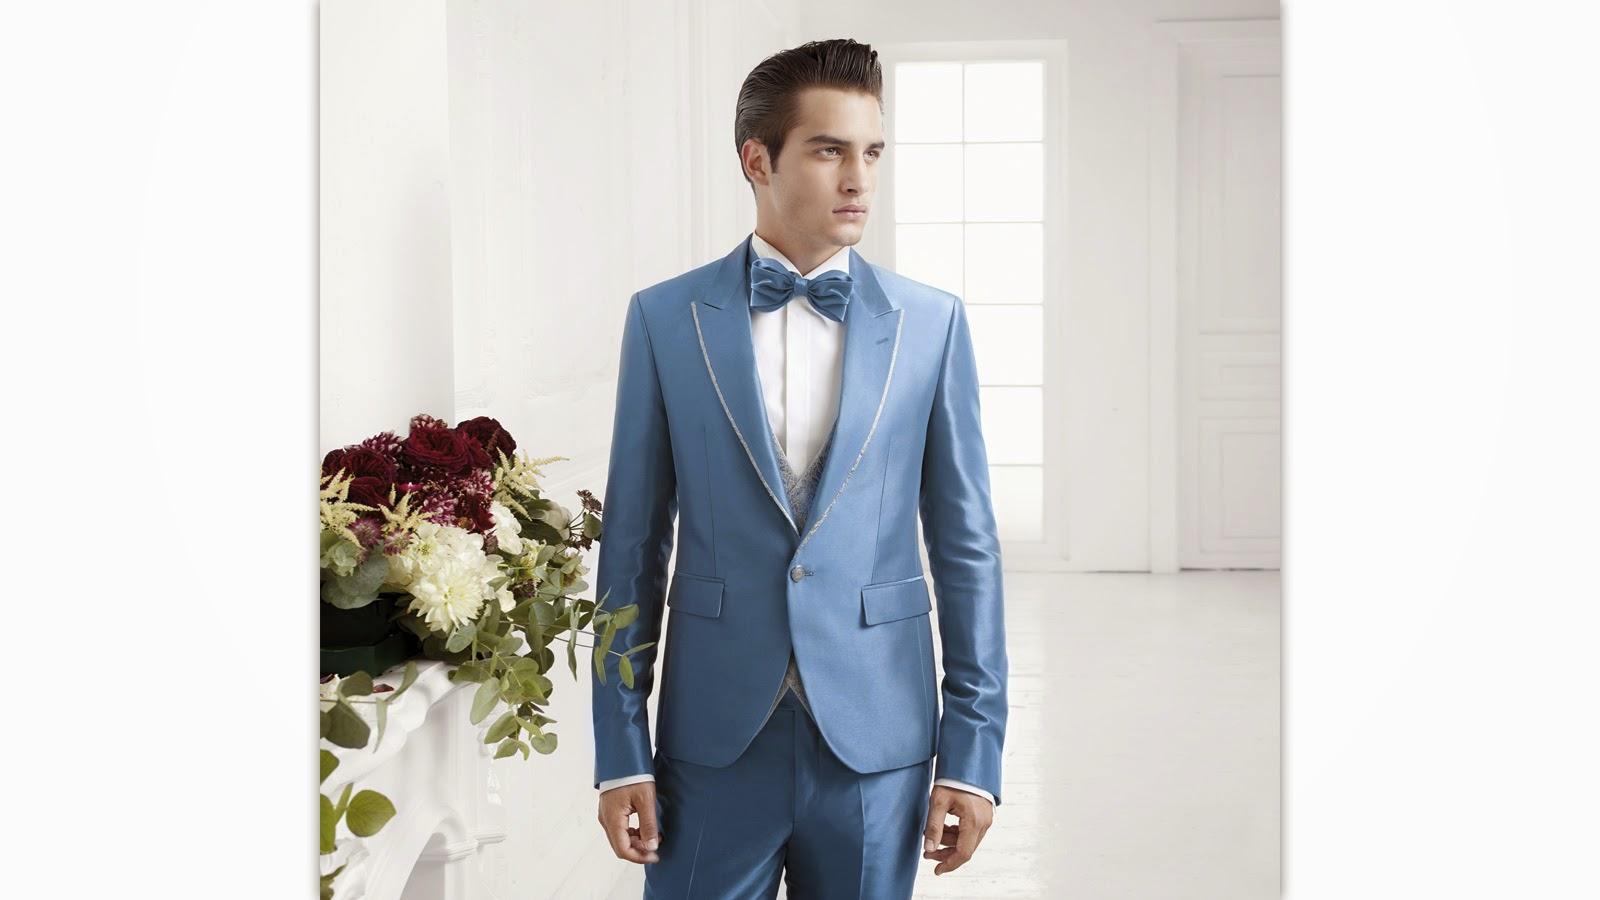 boda, Bodas 2015, Carlo Pignatelli, ceremonia, Especial Novios, menswear, Novios 2015, Suits and Shirts, trajes de novio,